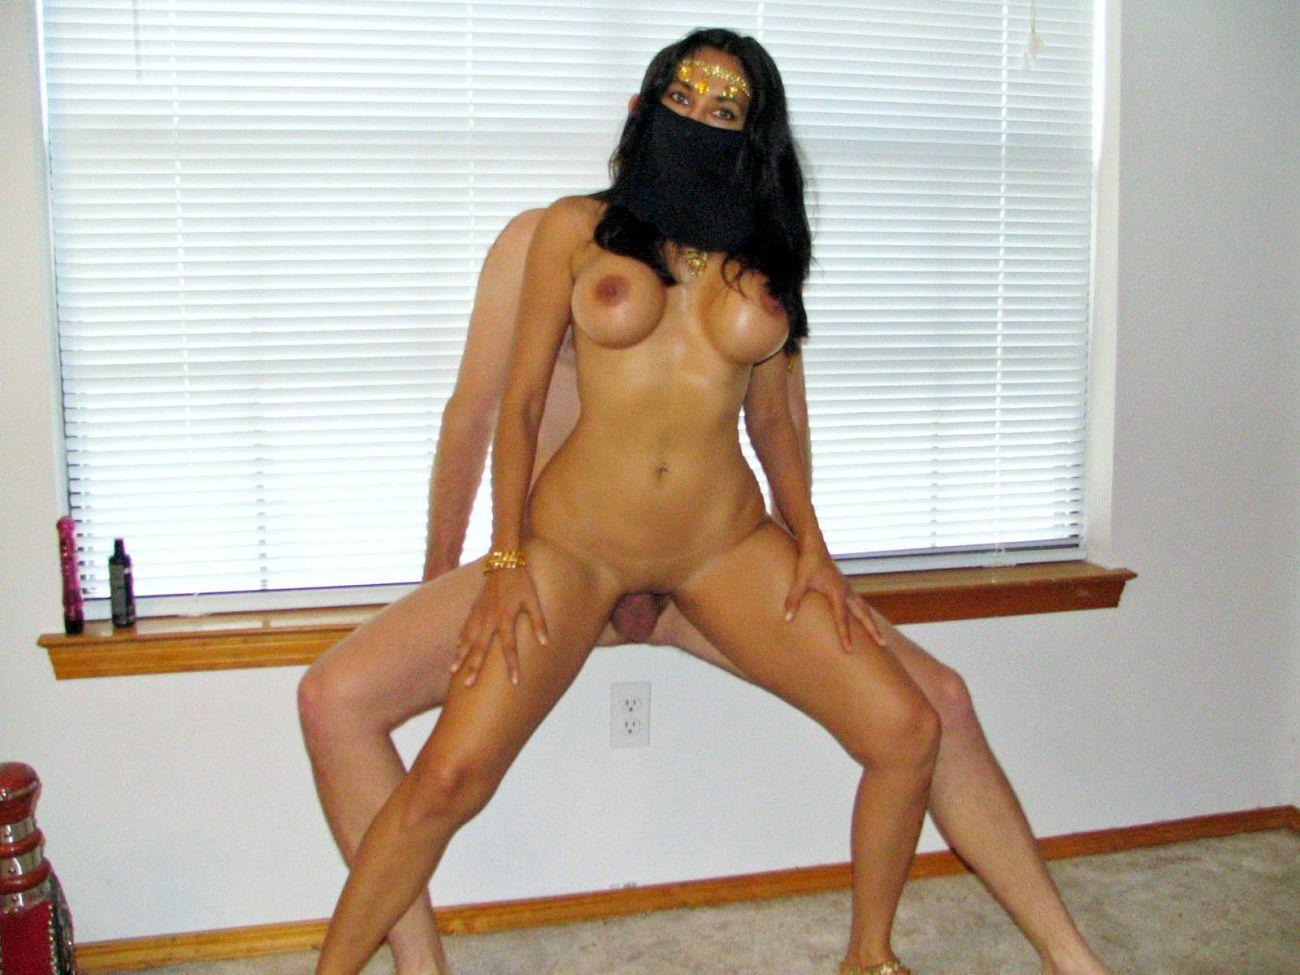 Beautiful arab girl having sex on sofa wearing white th porn pics